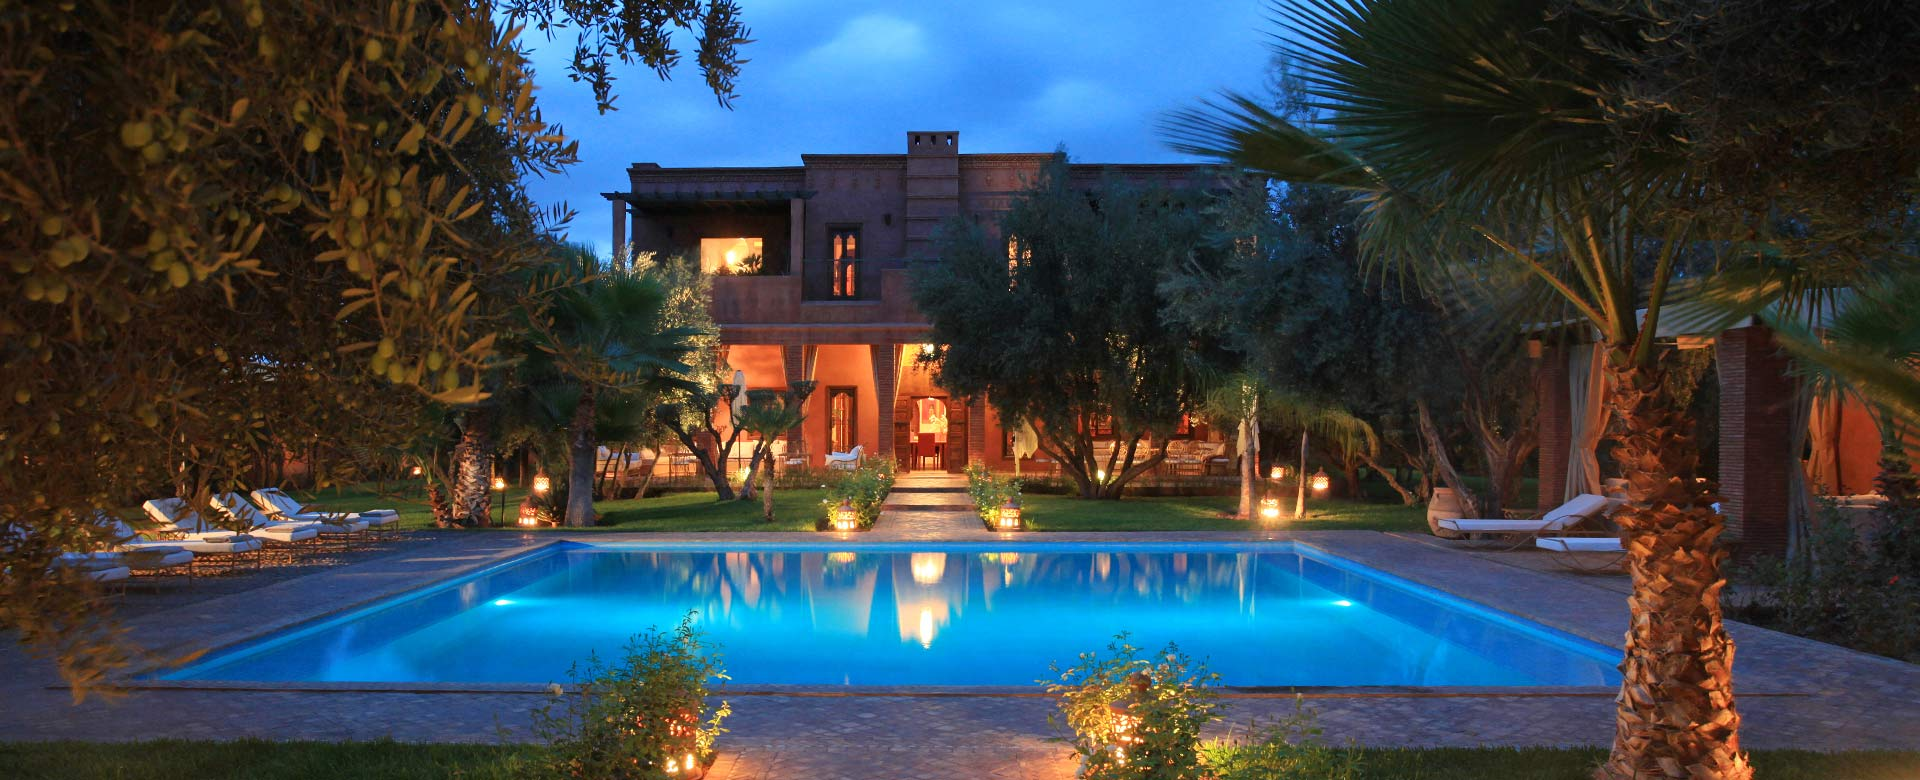 Alquiler casa en marrakech alquiler casa de lujo marrakech alquiler casa con piscina - Alquiler casas de lujo ...